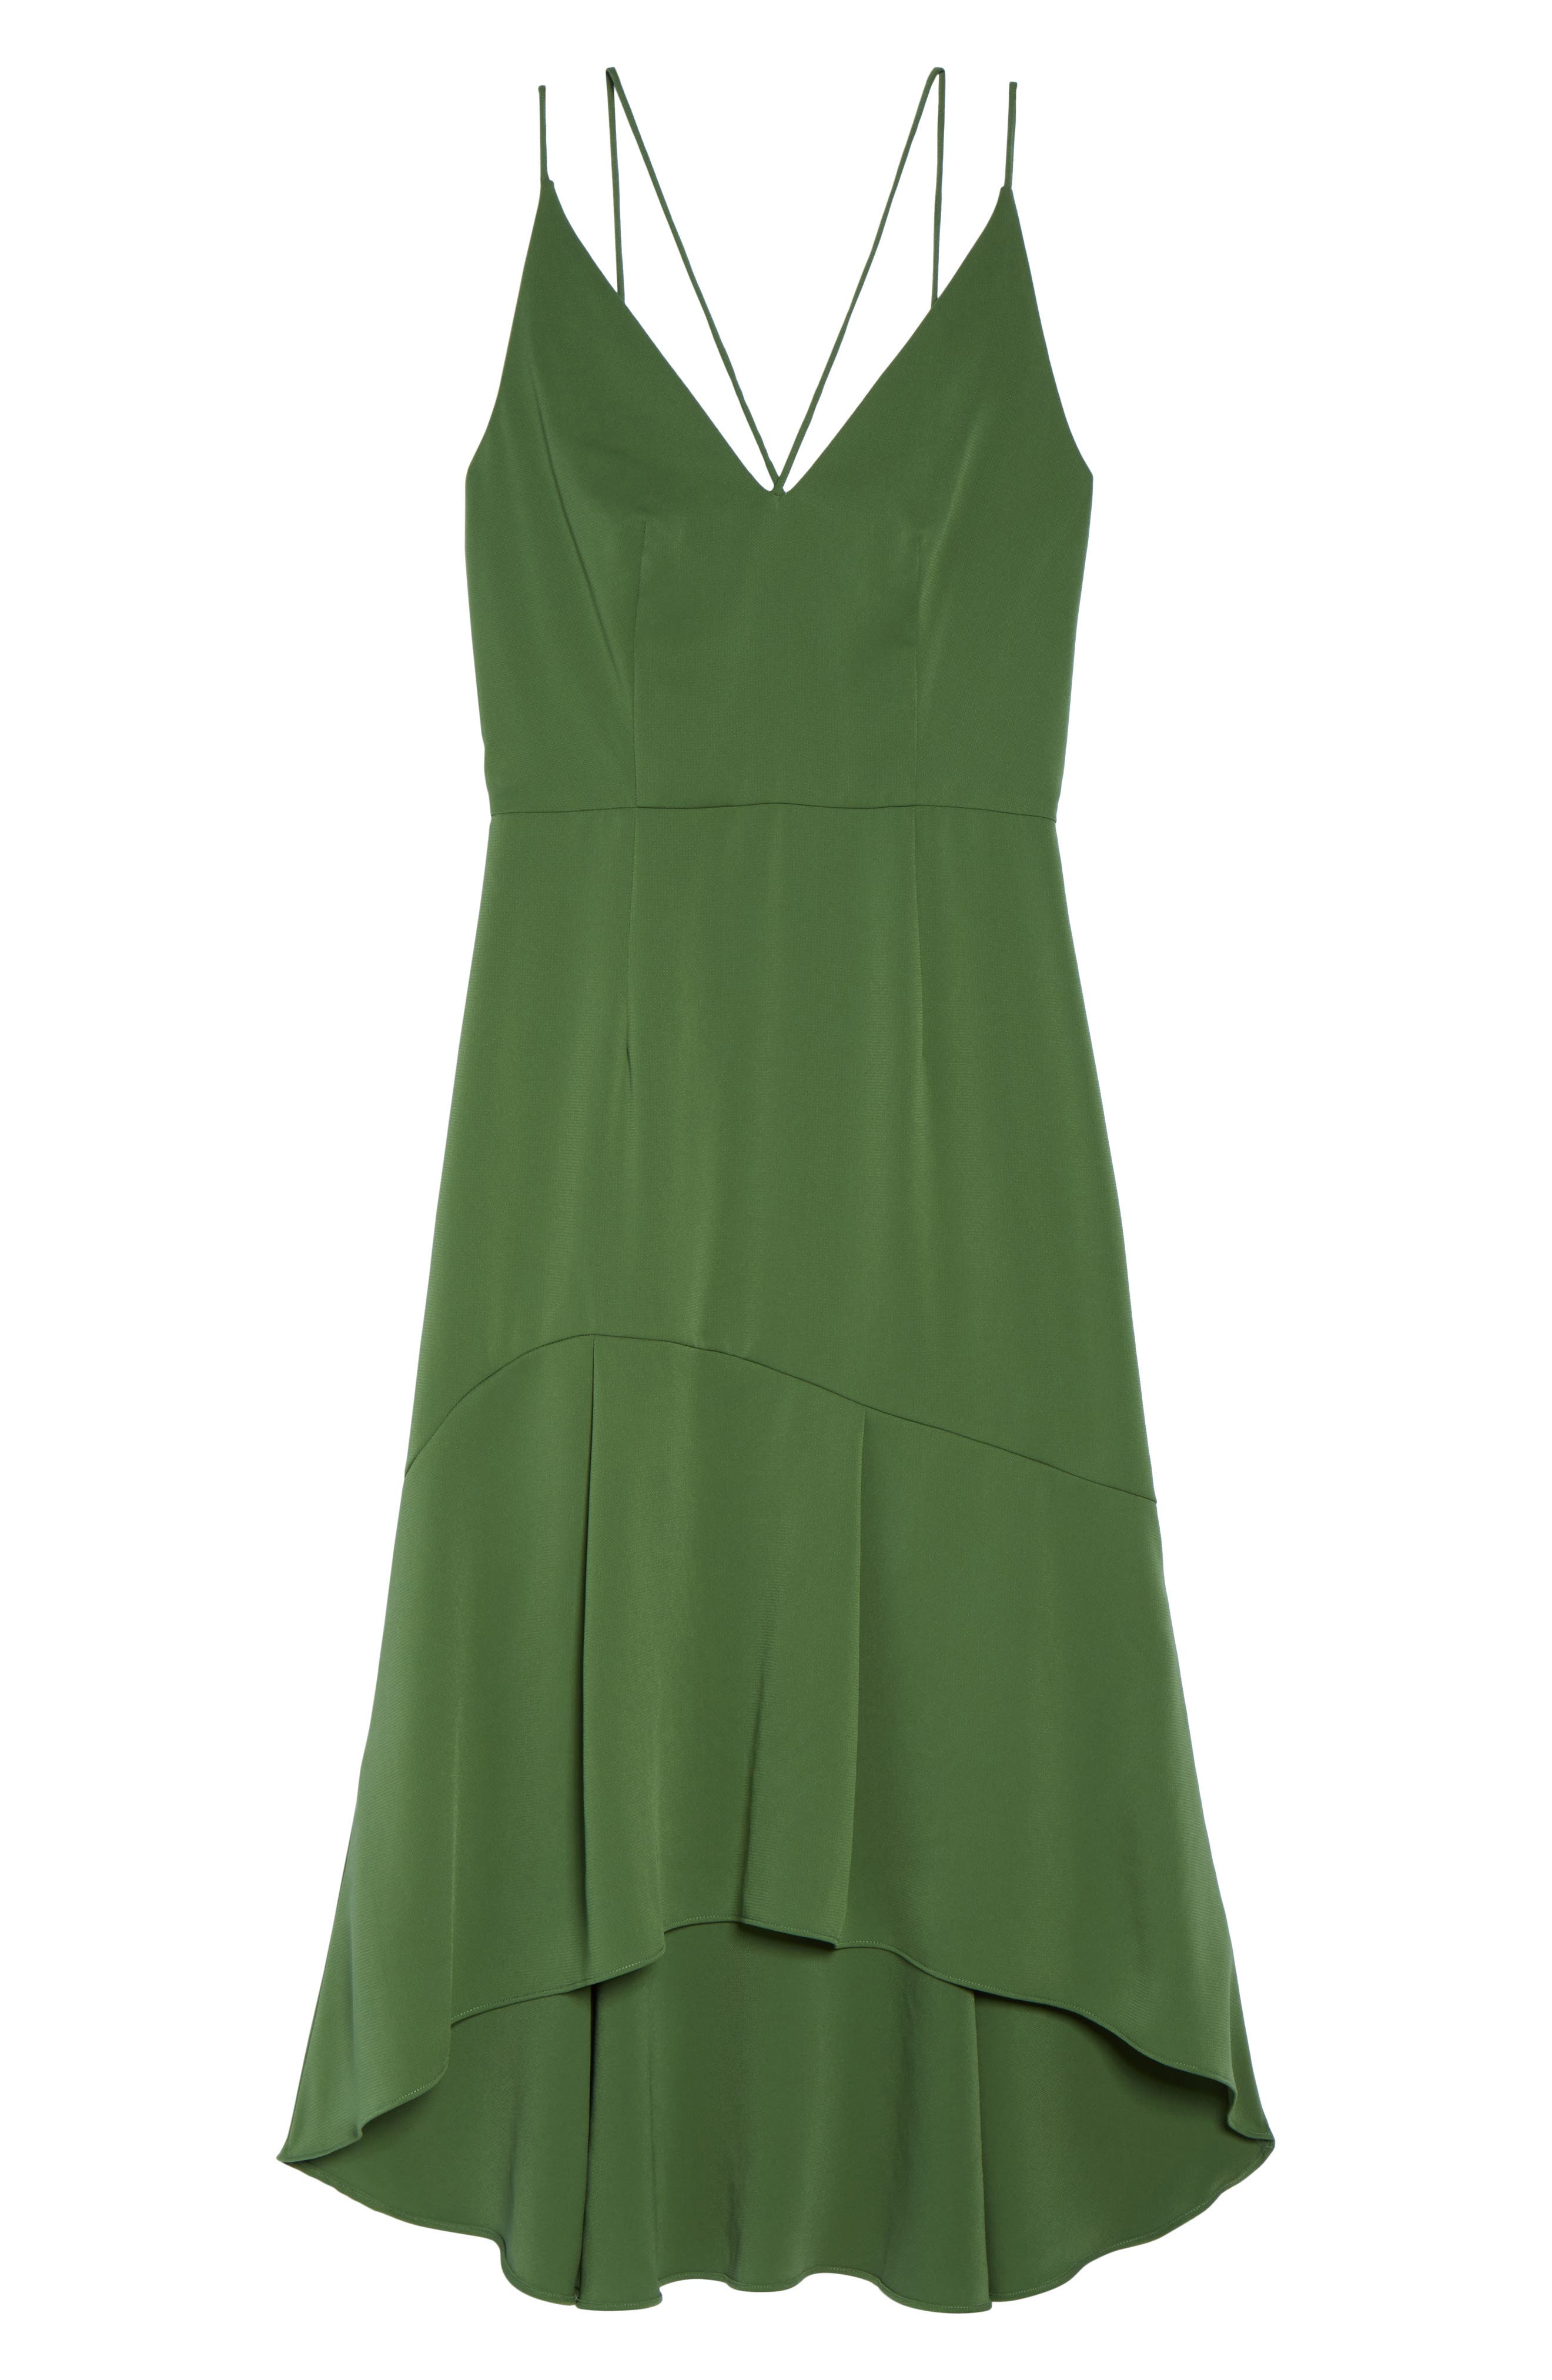 Lovine Midi Dress,                             Alternate thumbnail 6, color,                             Moss Green